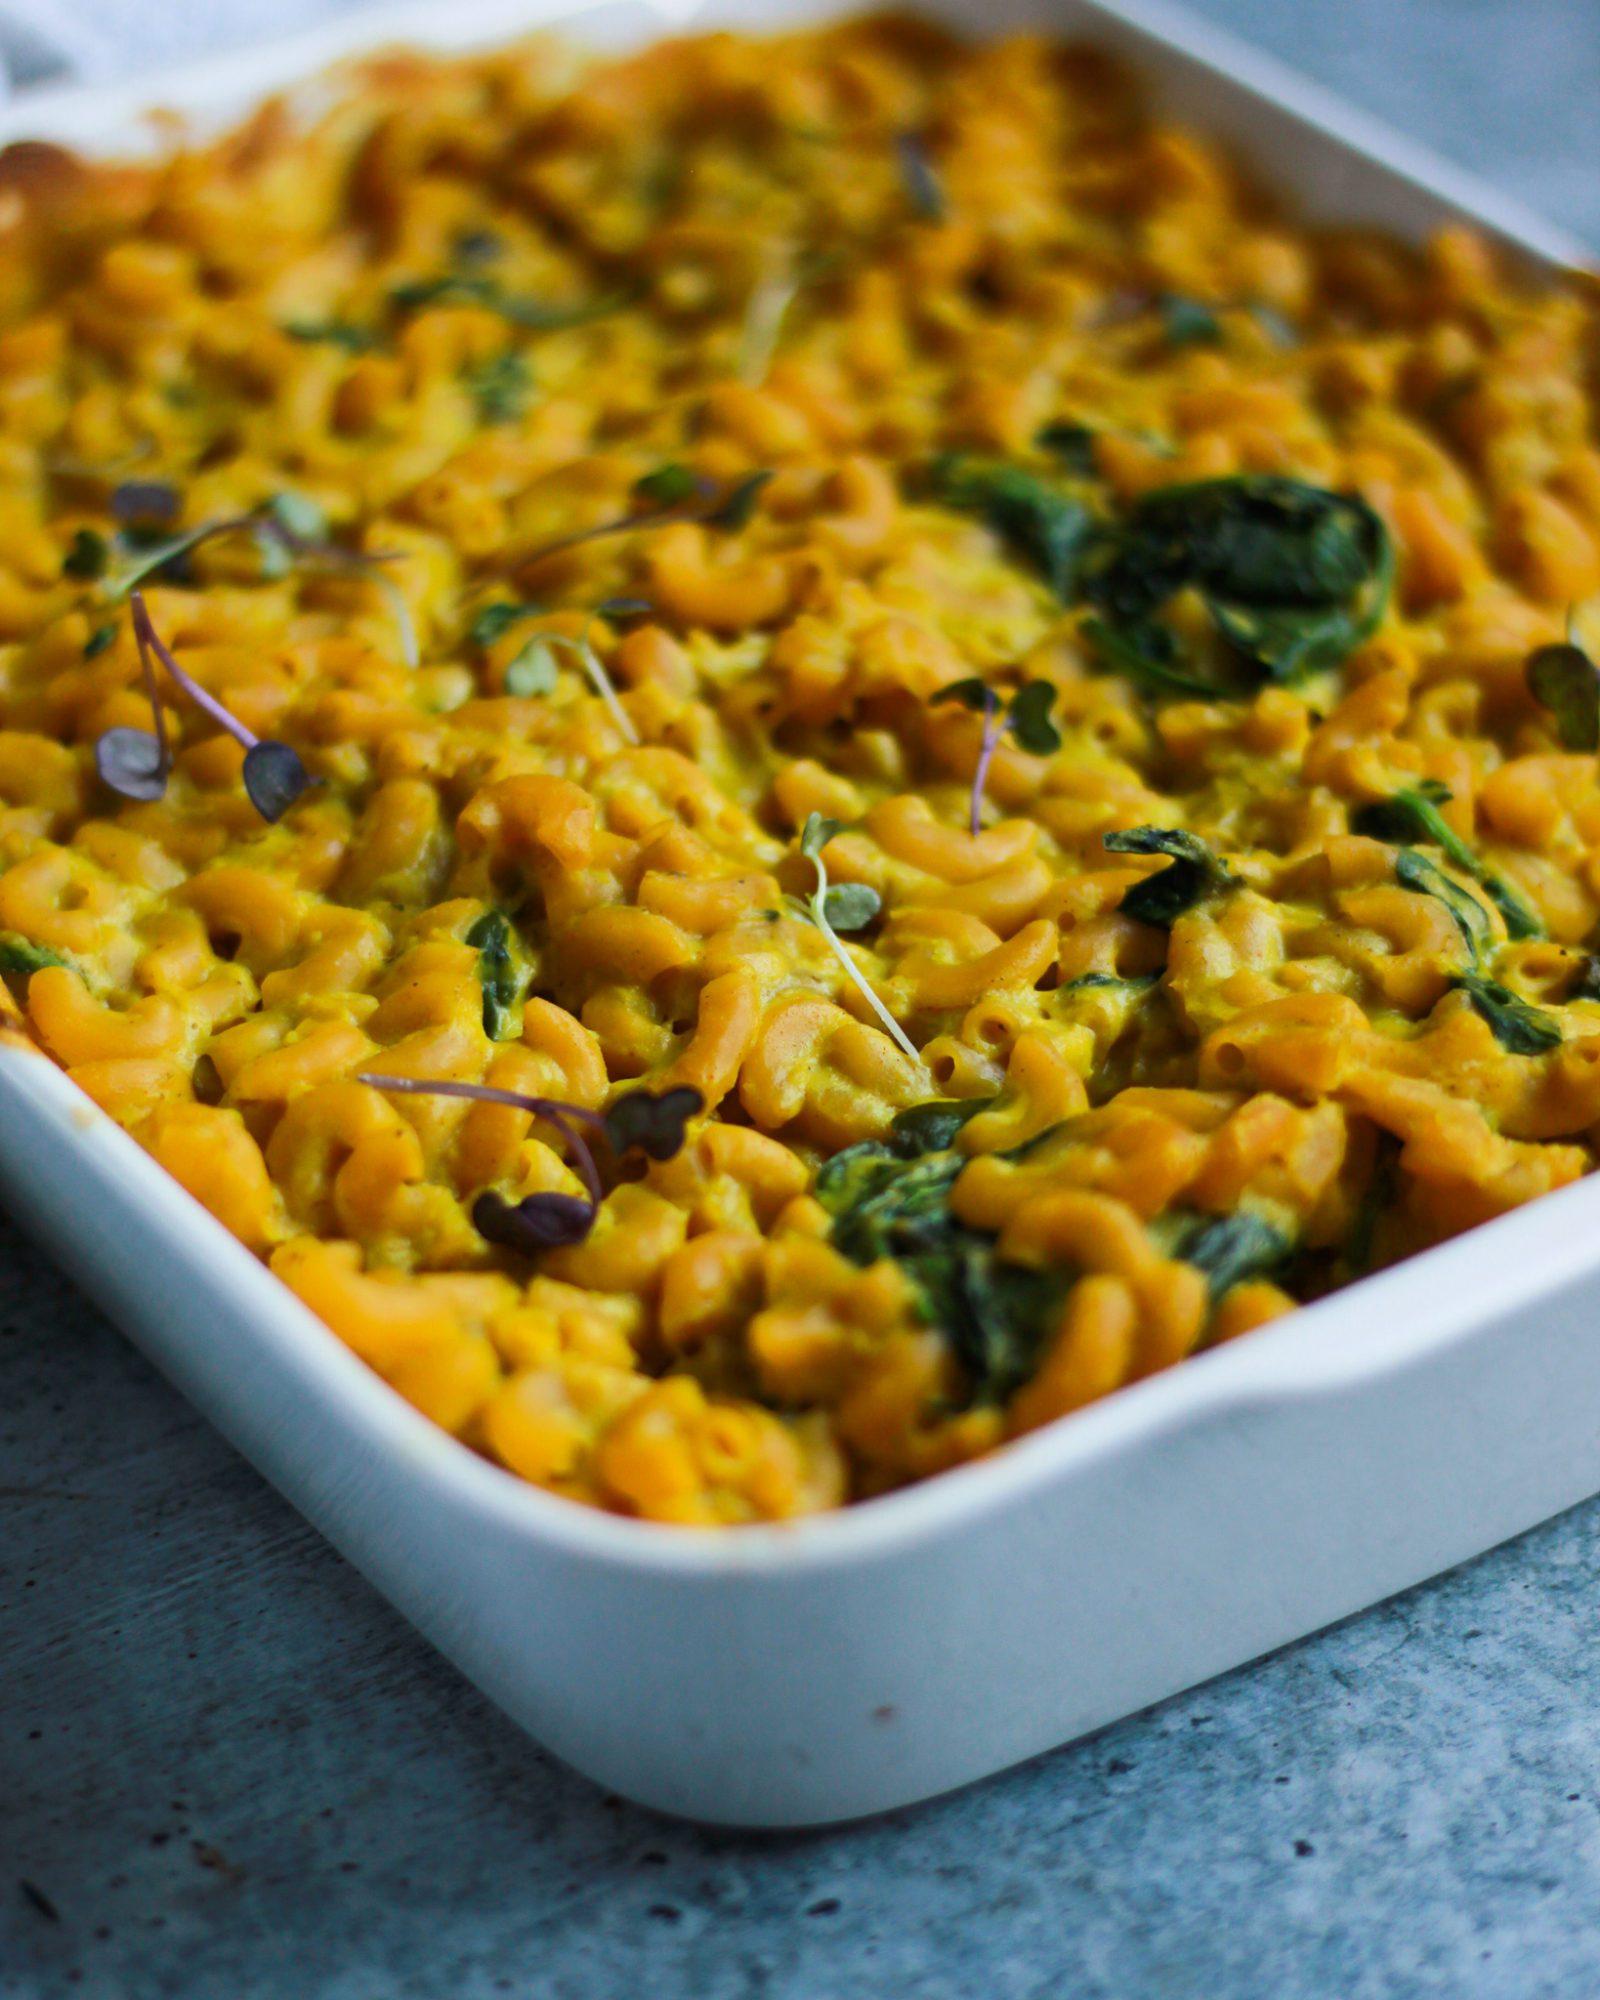 up close shot of baked vegan macaroni and cheese